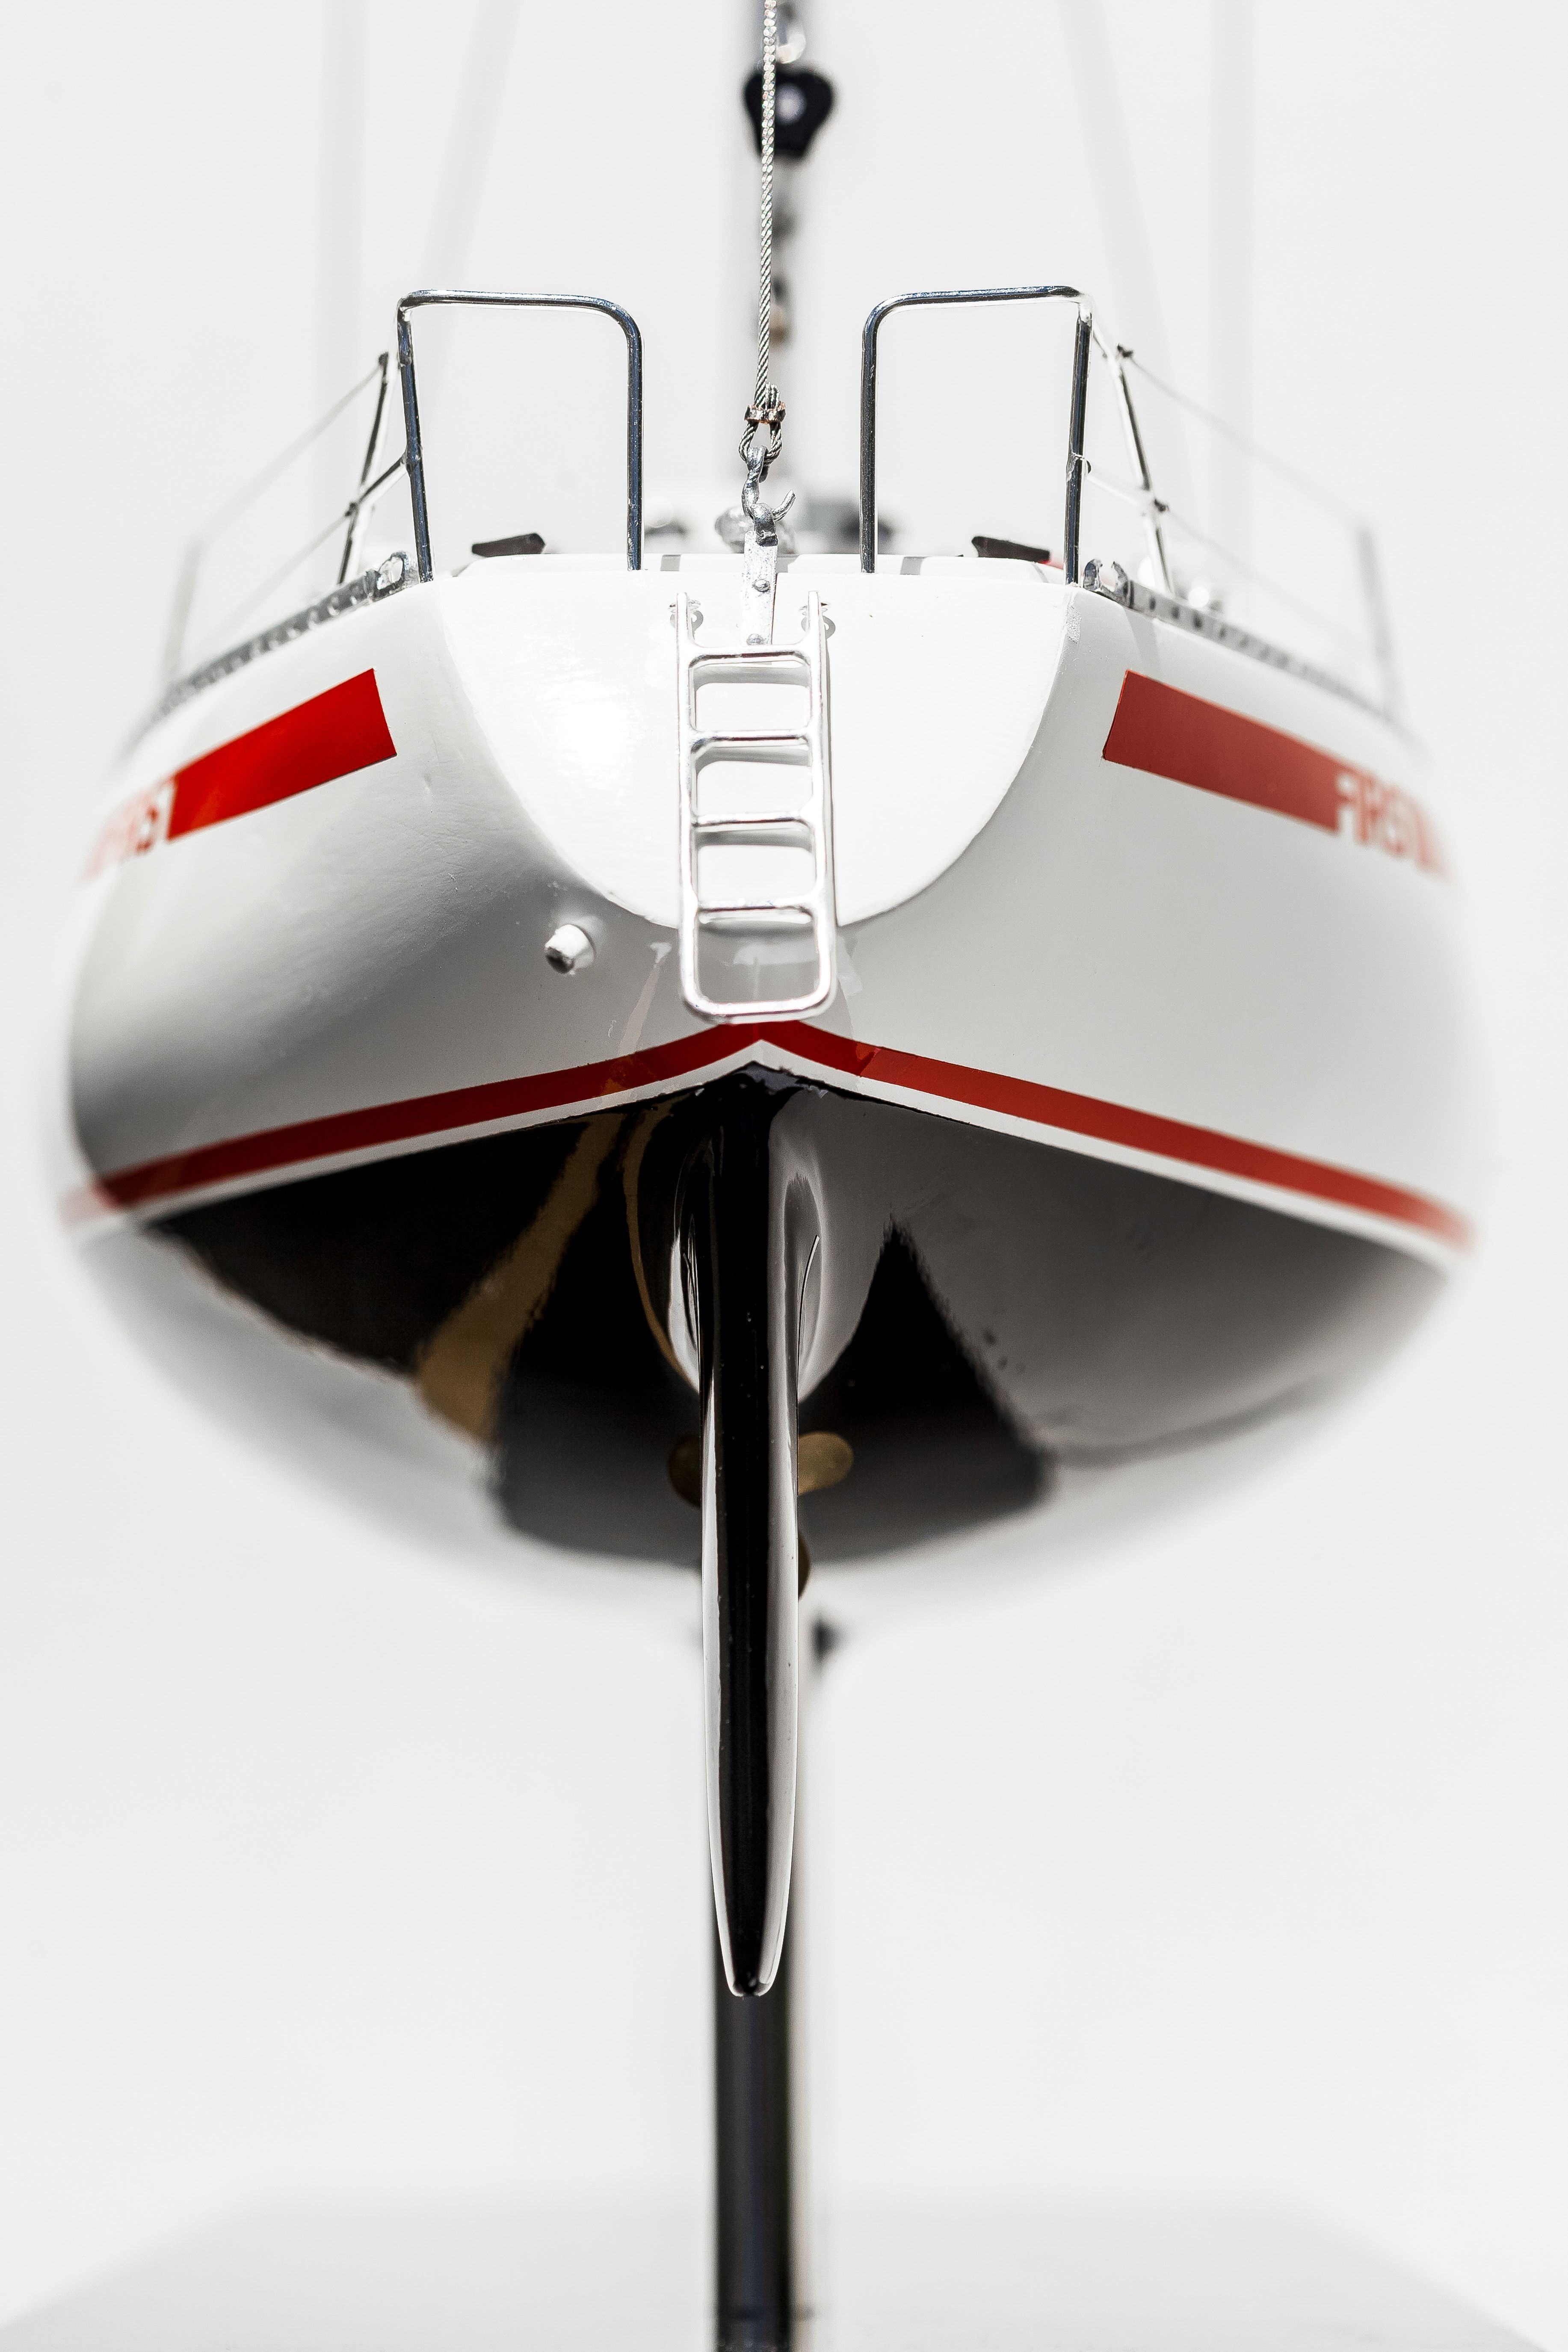 Beneteau First 30 Model Yacht (Superior Range) - HM